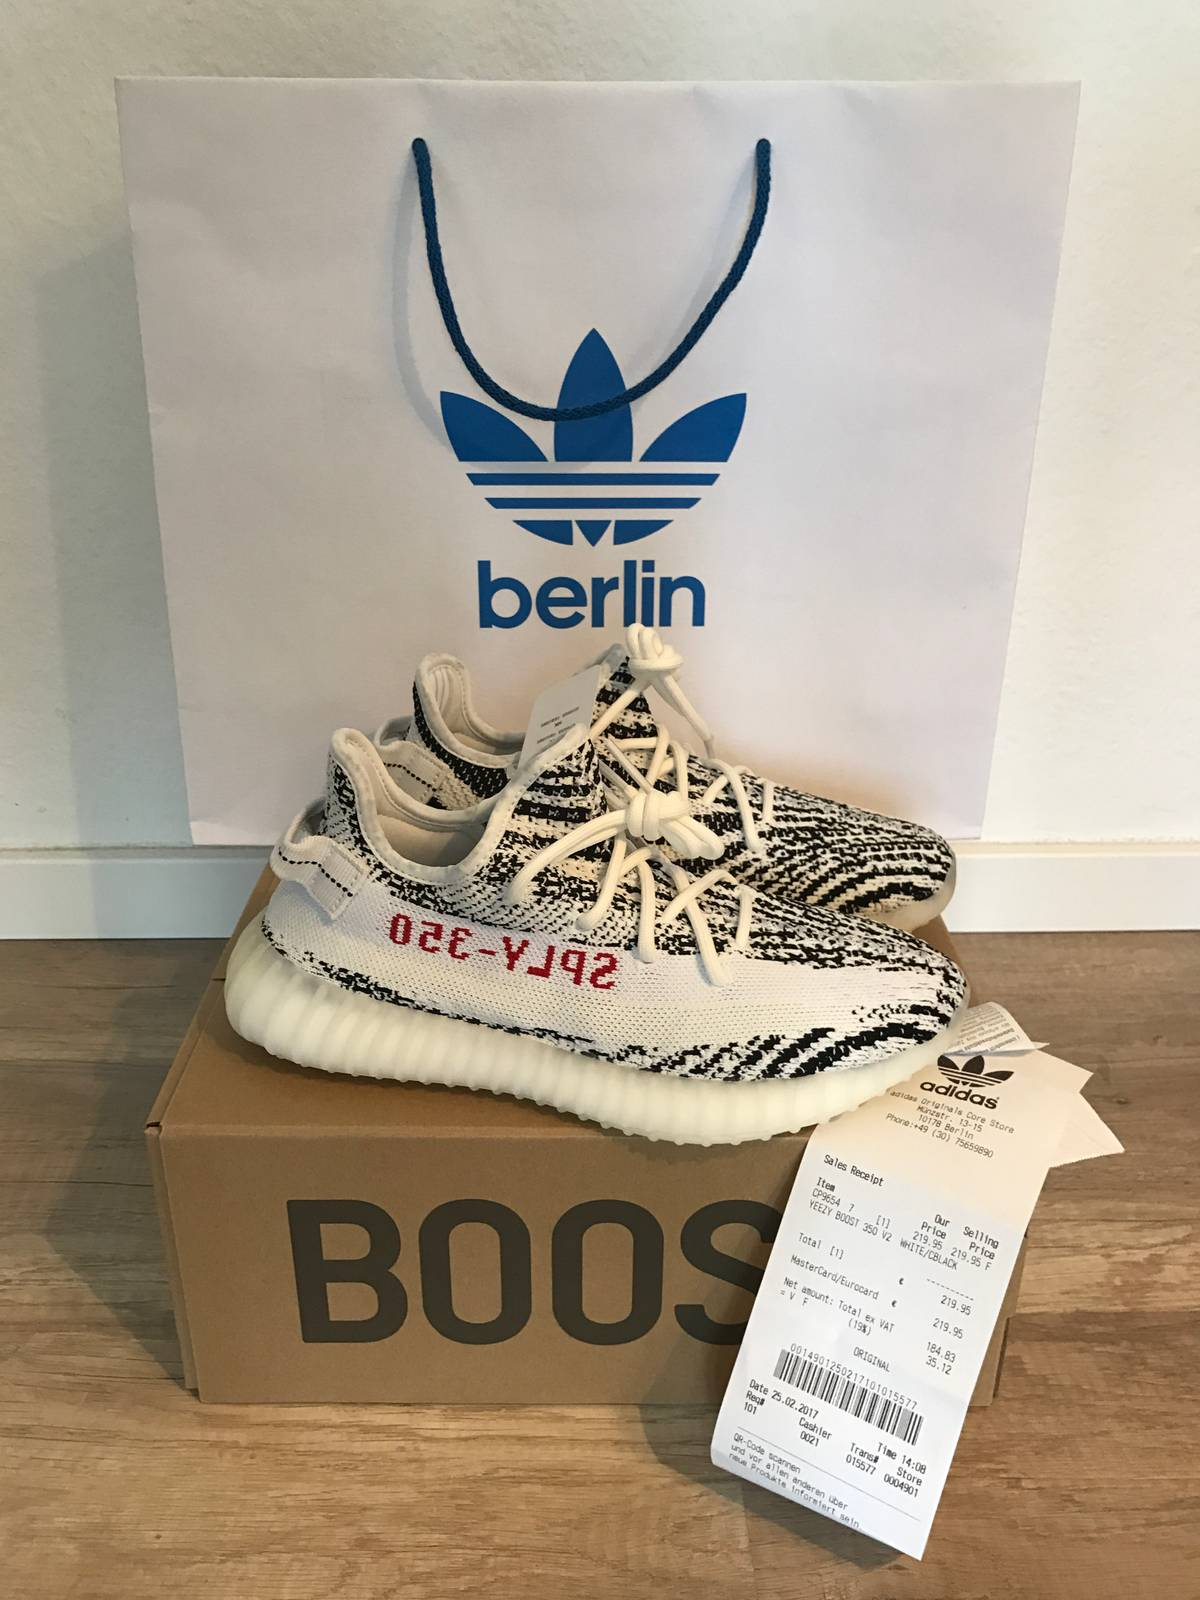 Adidas Yeezy Boost 350 V2 BY1604 Pre Release Megathread 12/17